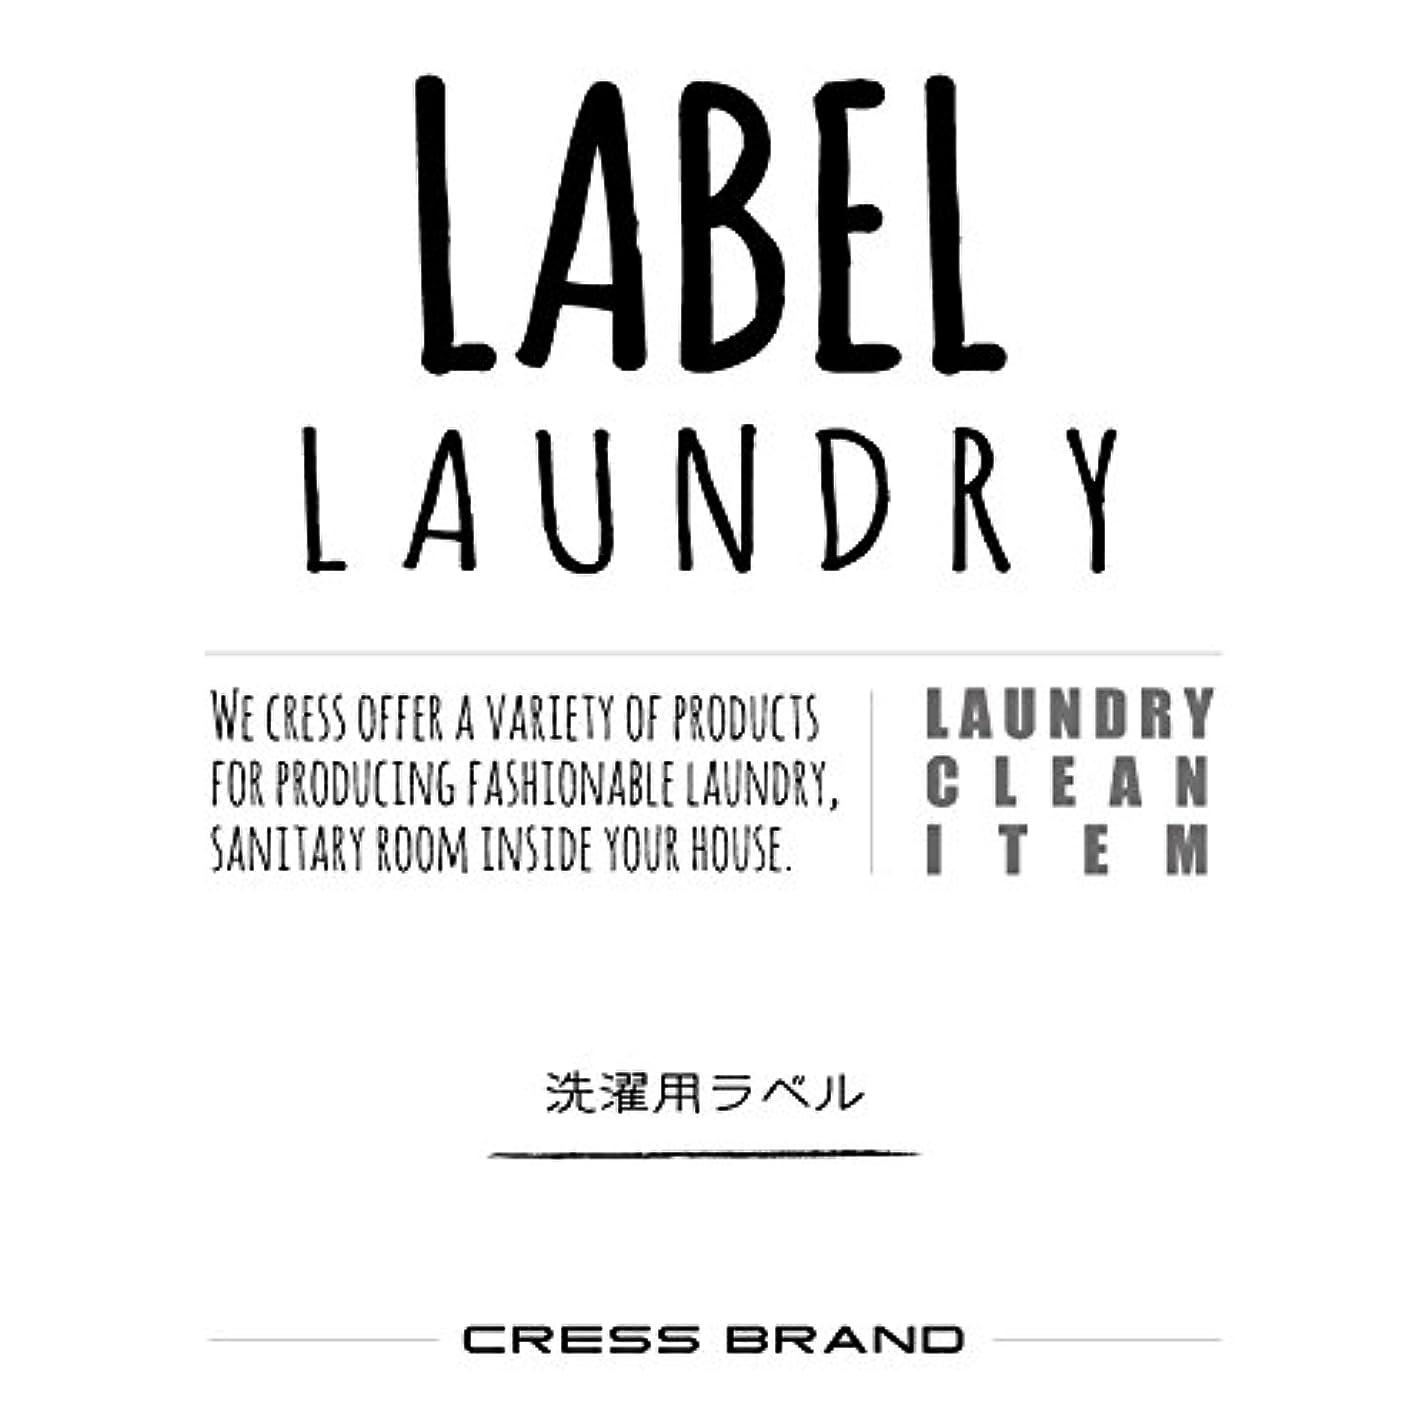 Skinny-Laundry-label 『手書きスキニー調?ランドリーラベル』ラベルのみ